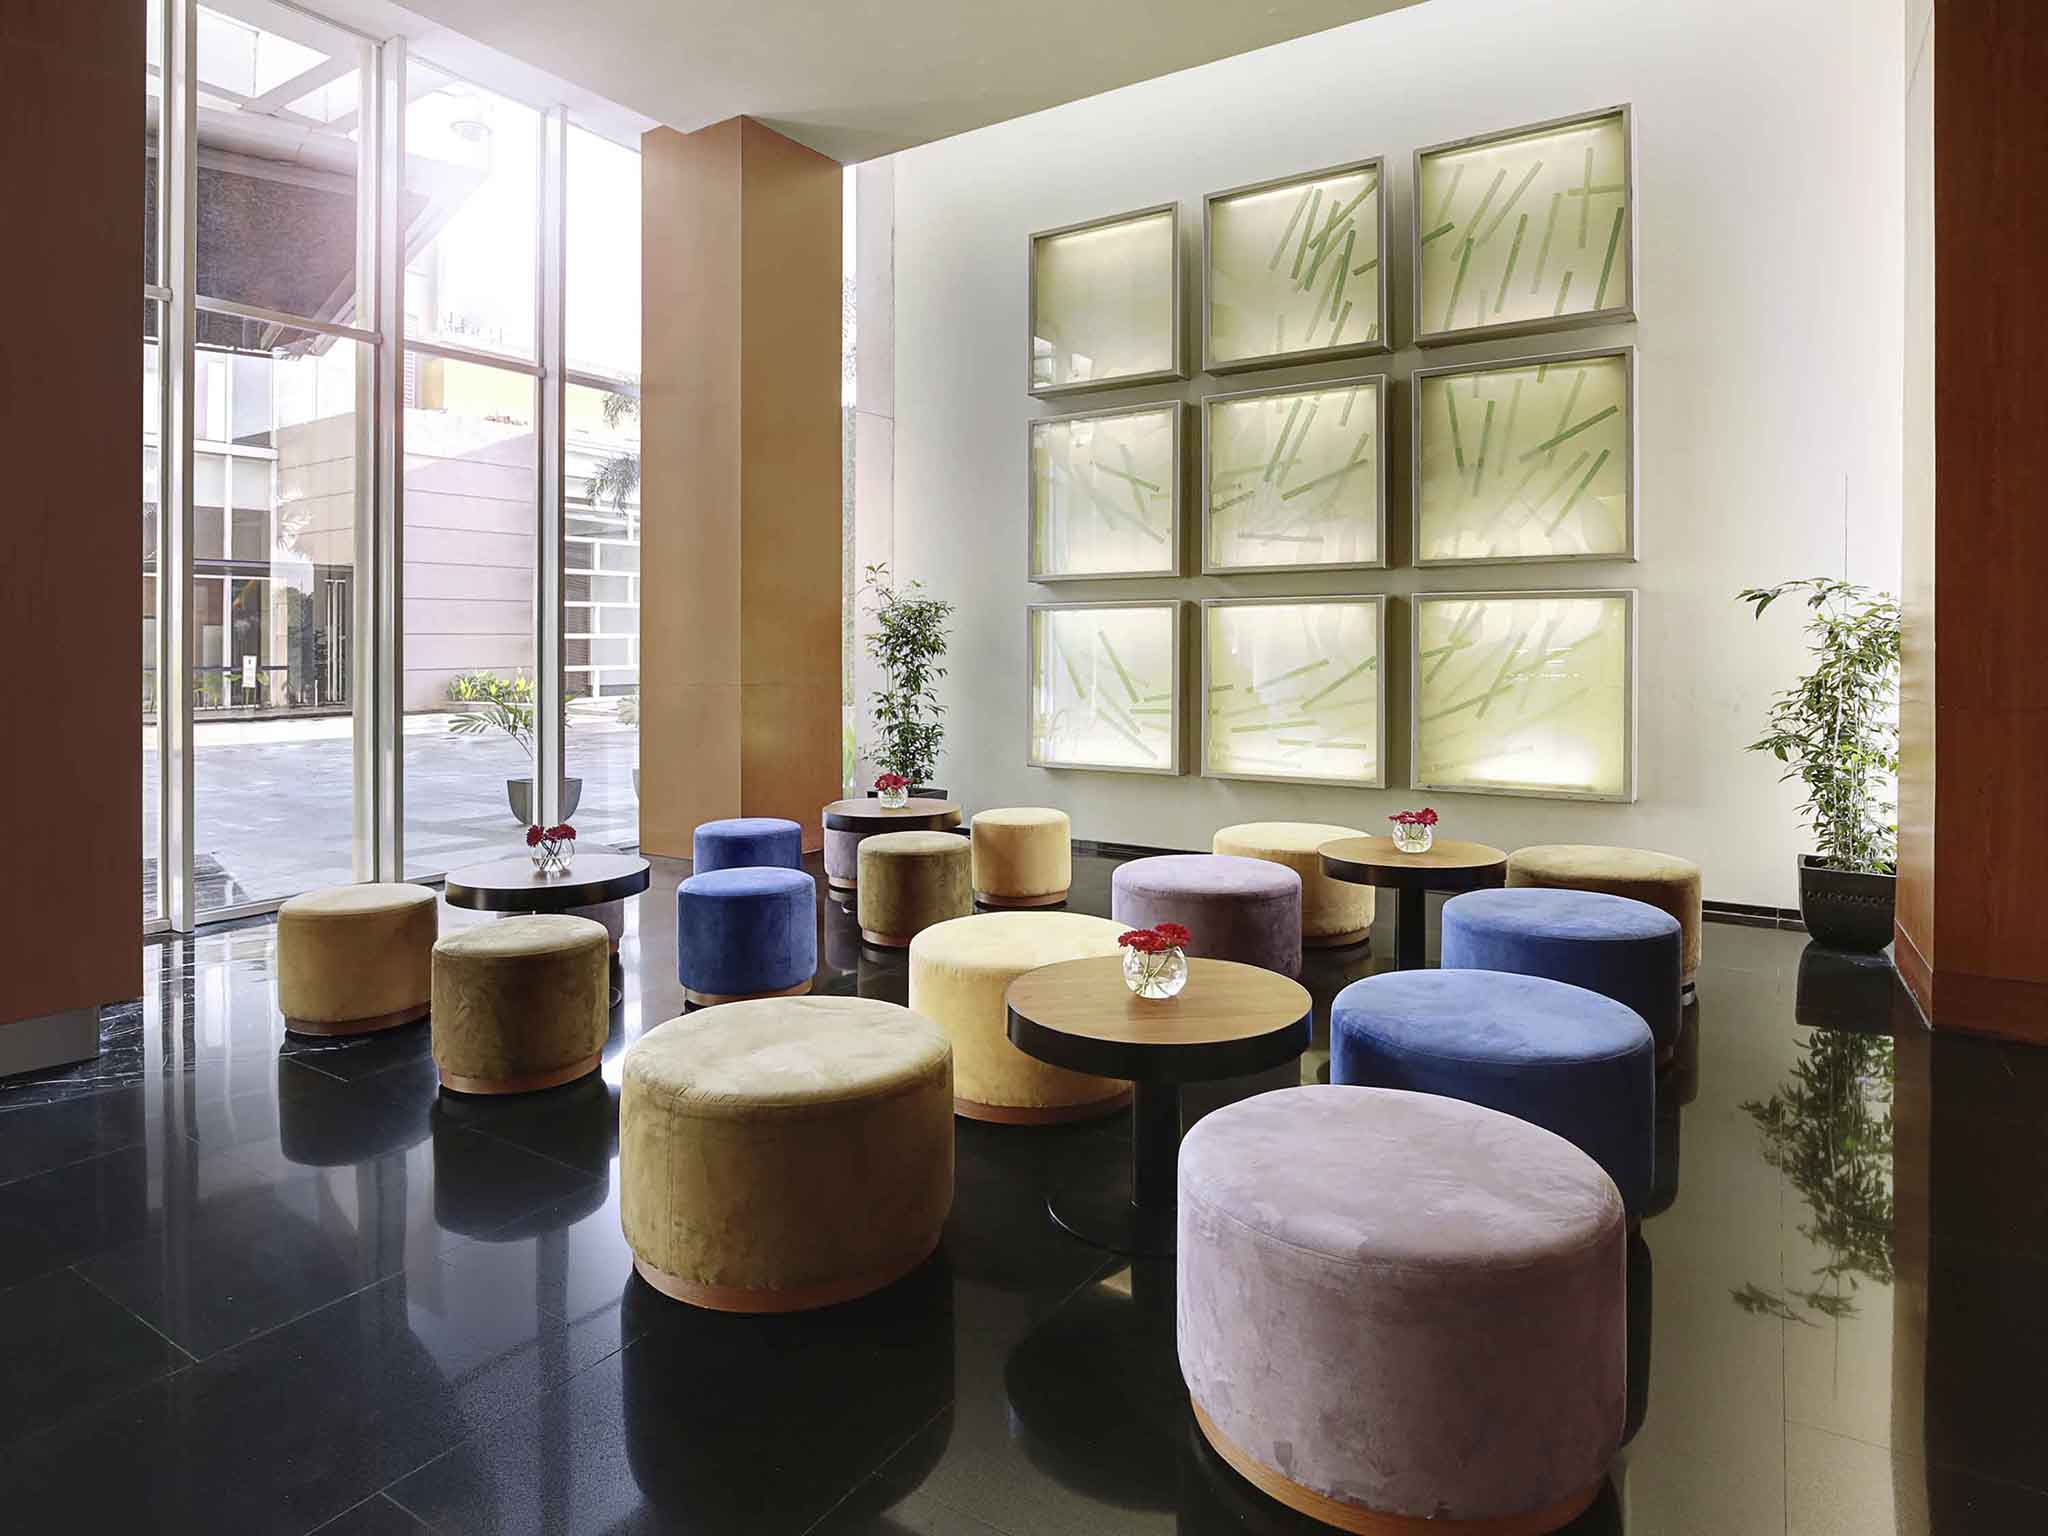 Novotel Bandung 4 Star International Hotel In Paket Murmer Acces Point Komplit Services